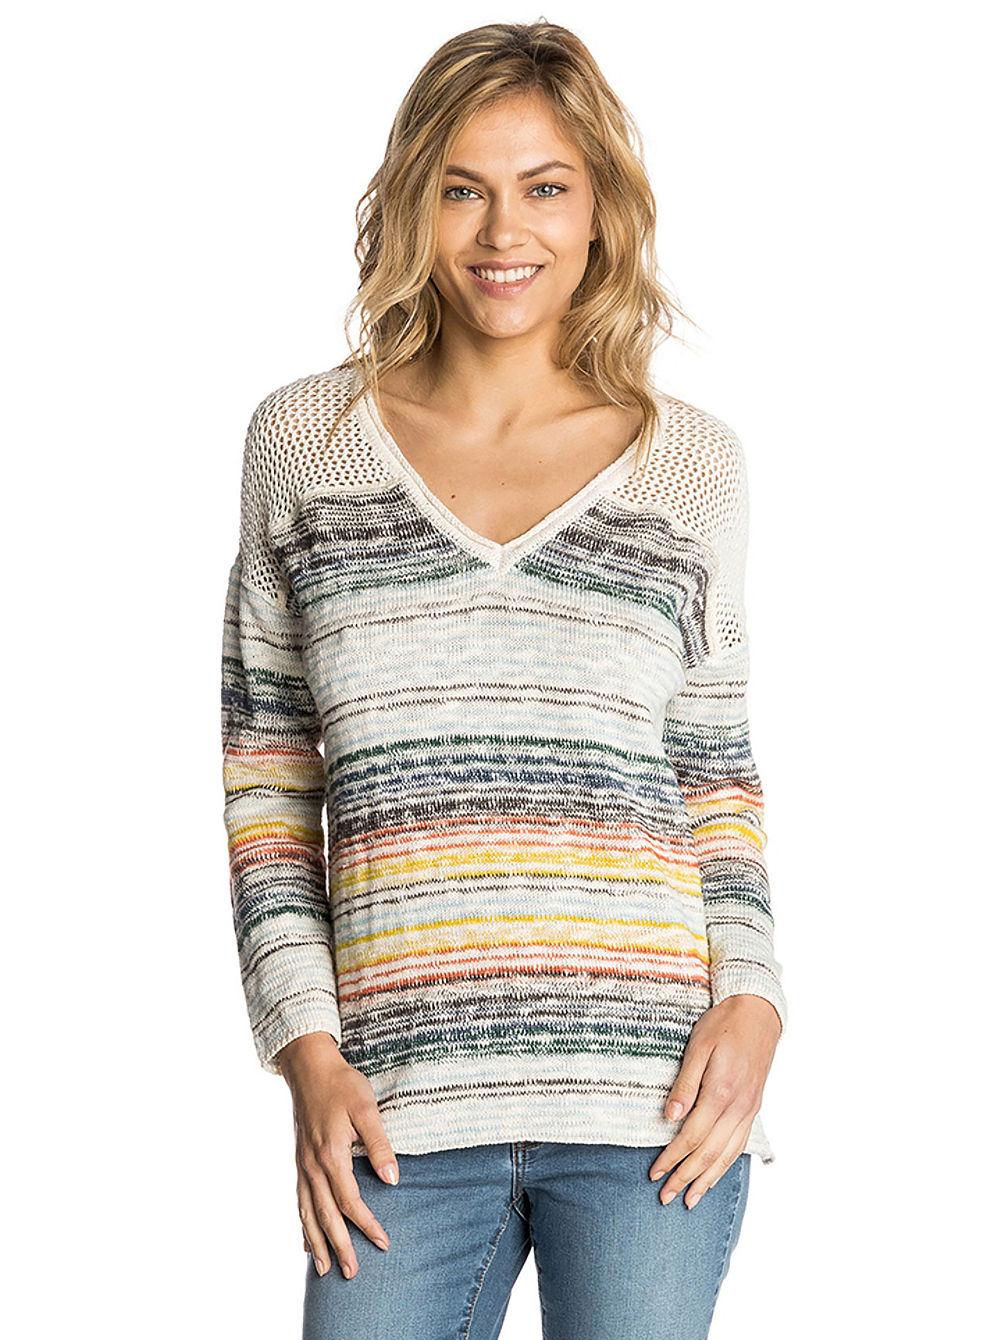 31063c9fd0 Buy Rip Curl Beach Bazaar Sweater online at Blue Tomato